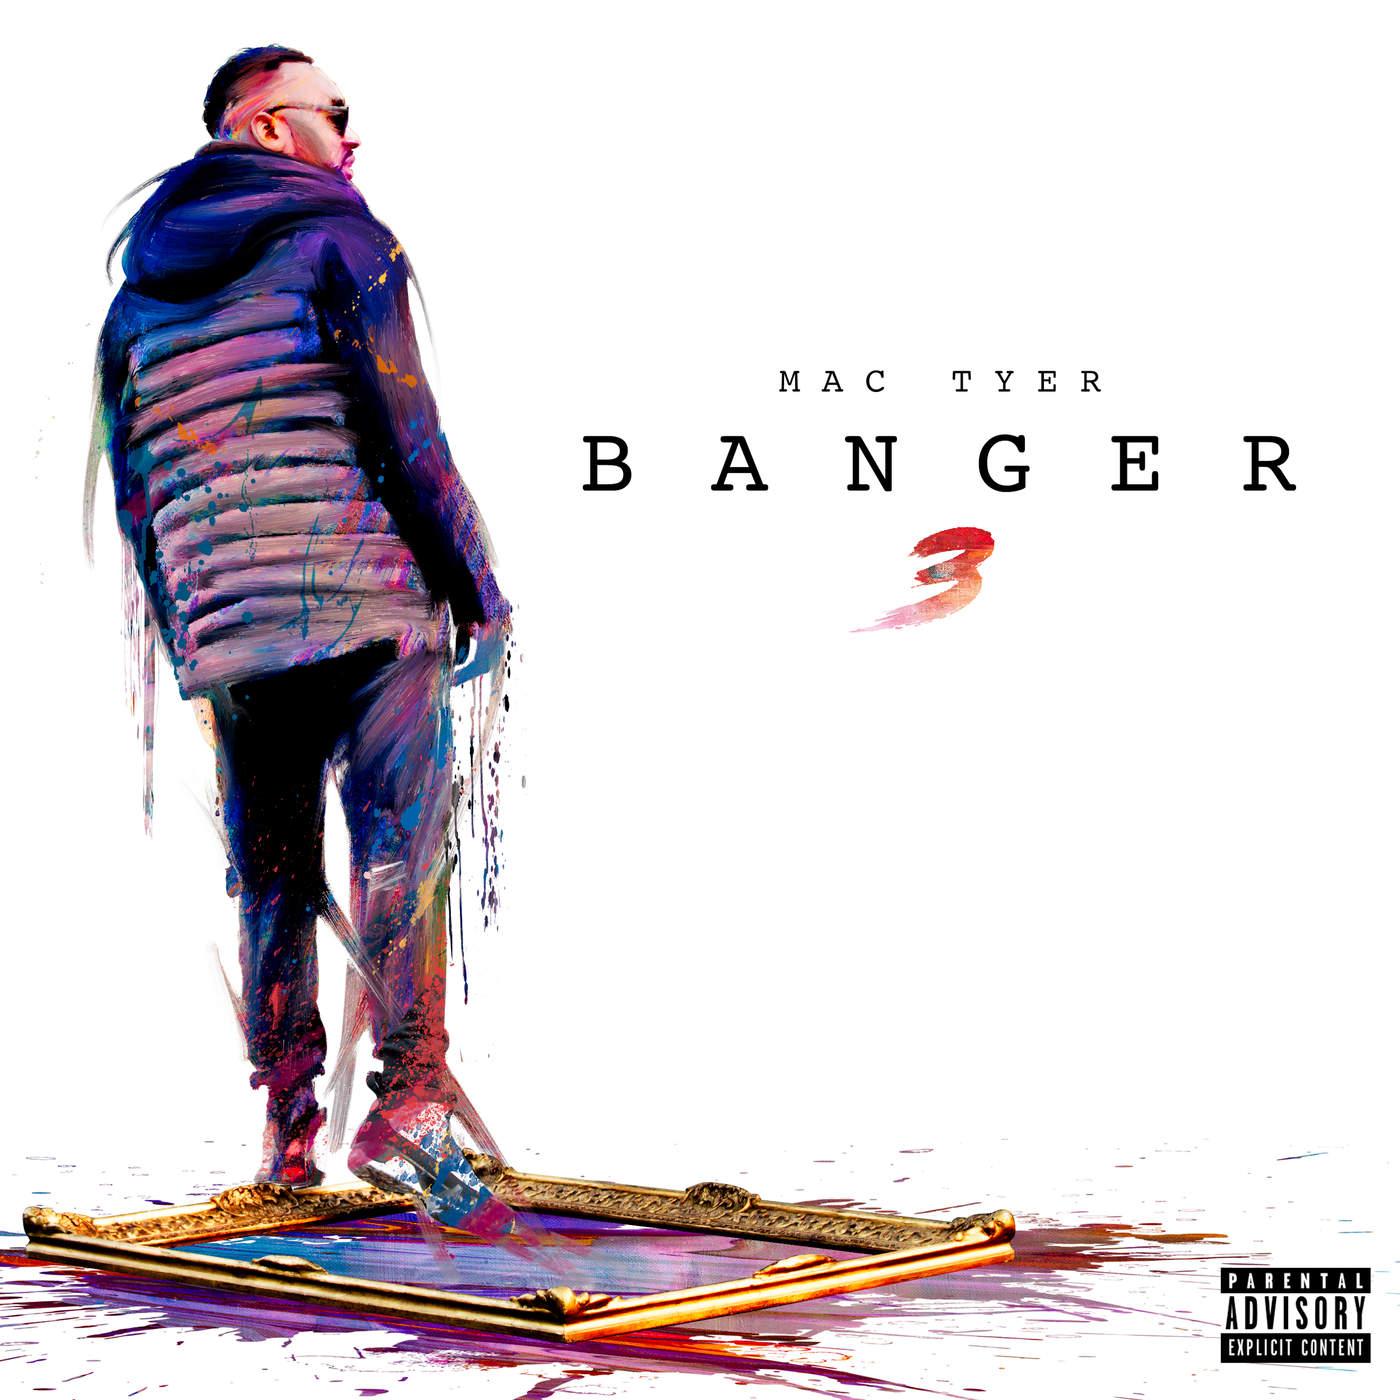 Mac Tyer - Banger 3 Cover